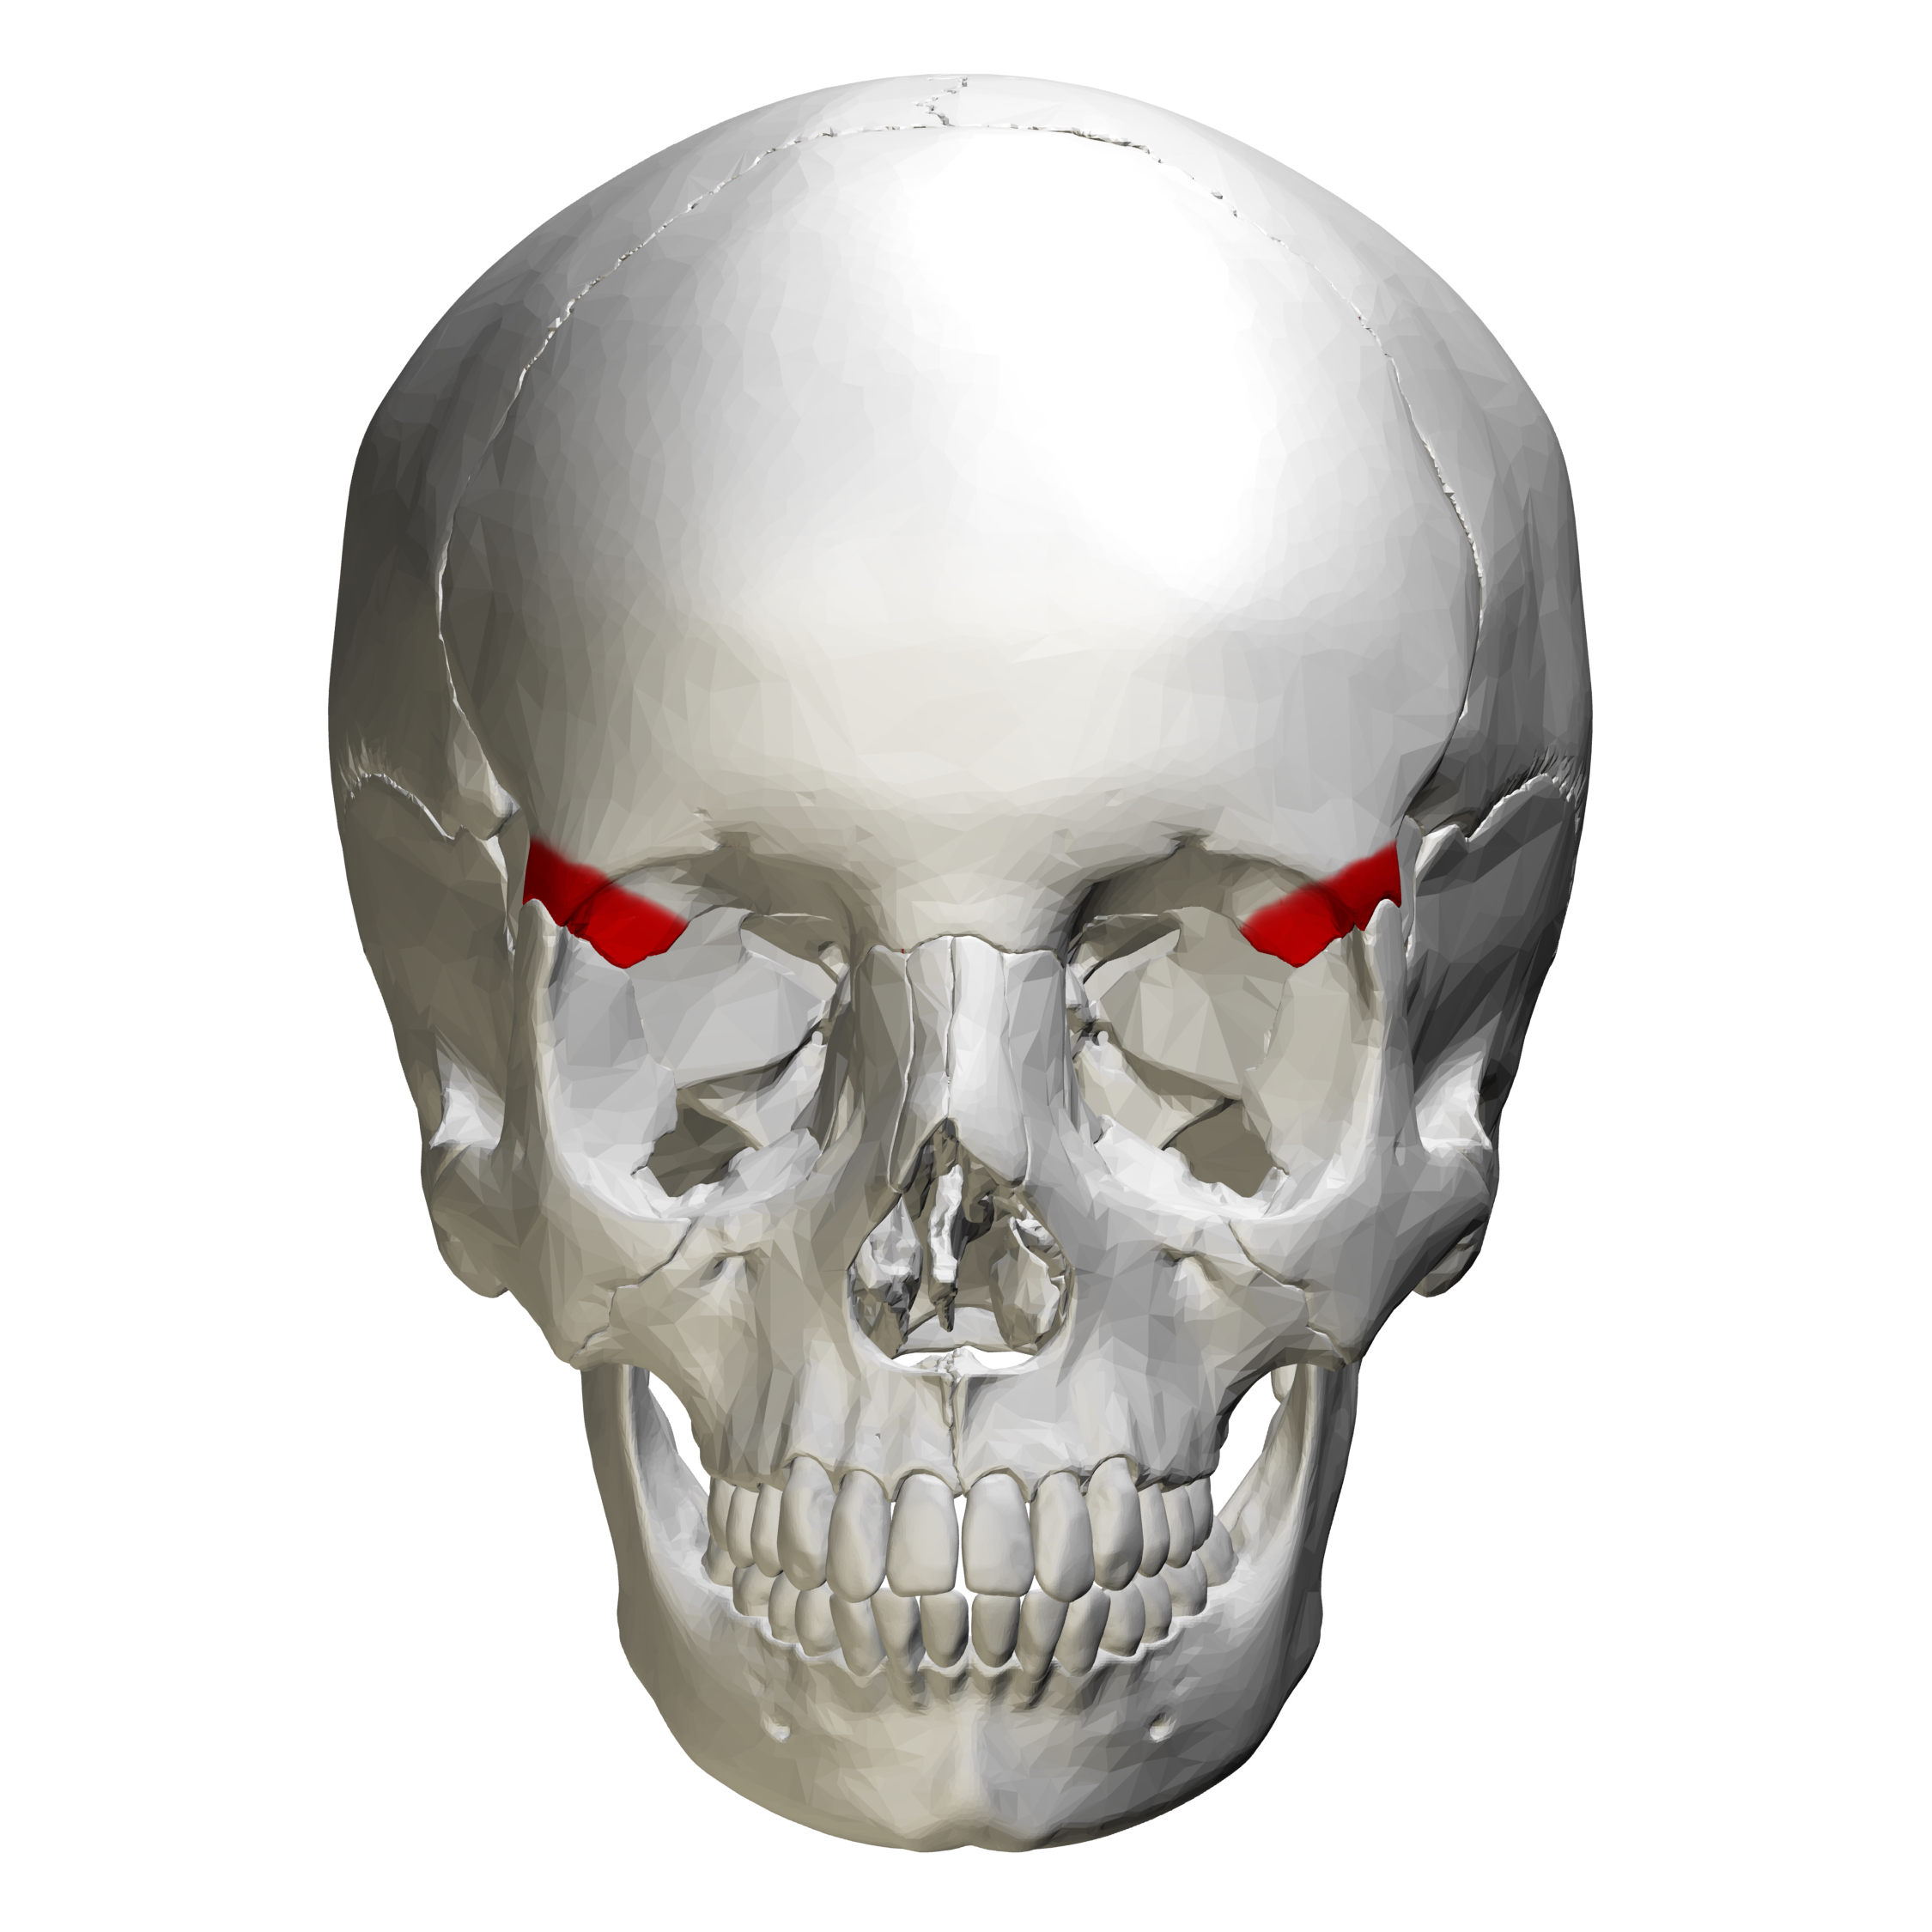 Filezygomatic Process Of Frontal Bone Skull Anterior Viewg